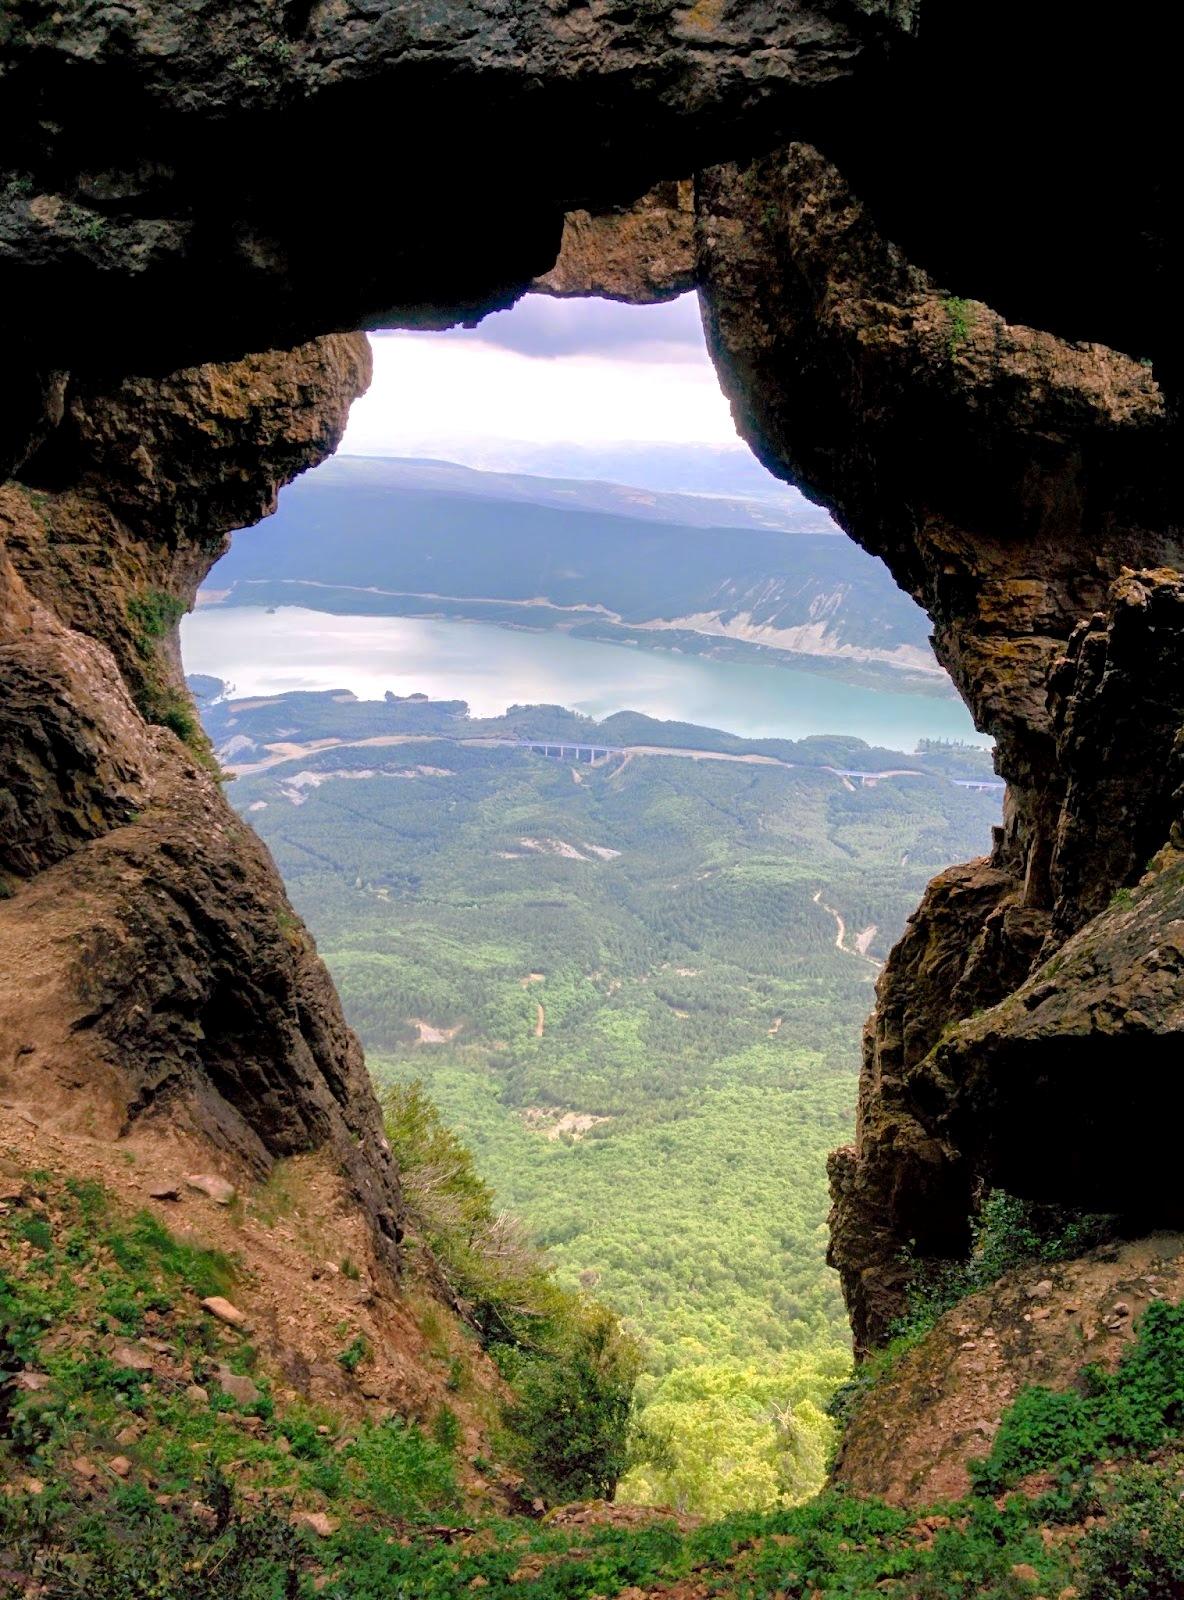 (28-Octubre) CASTELLAR (1.286 m) - PASO DEL OSO (SIERRA DE LEIRE)